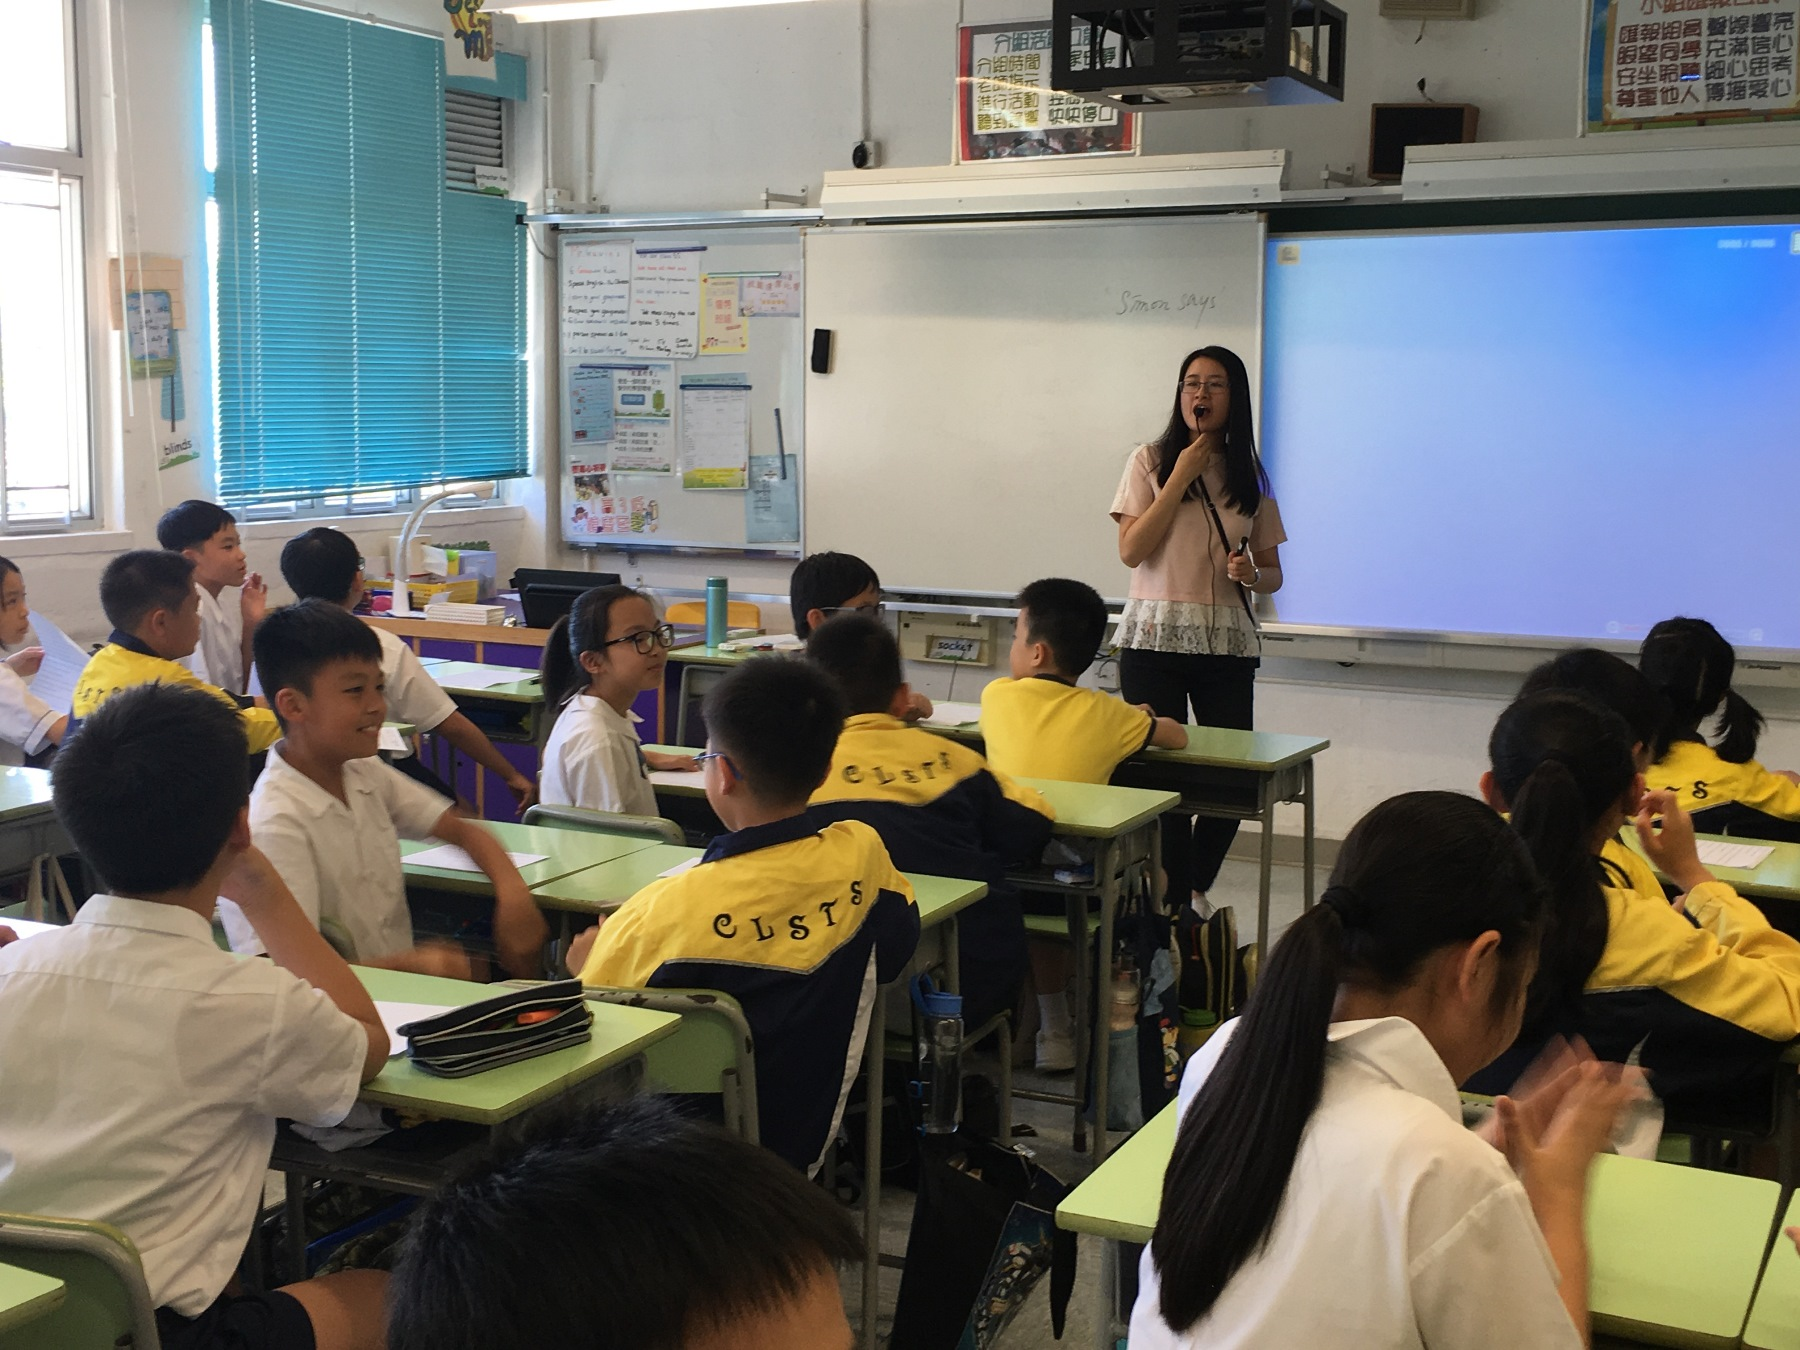 http://npc.edu.hk/sites/default/files/img_7116.jpg